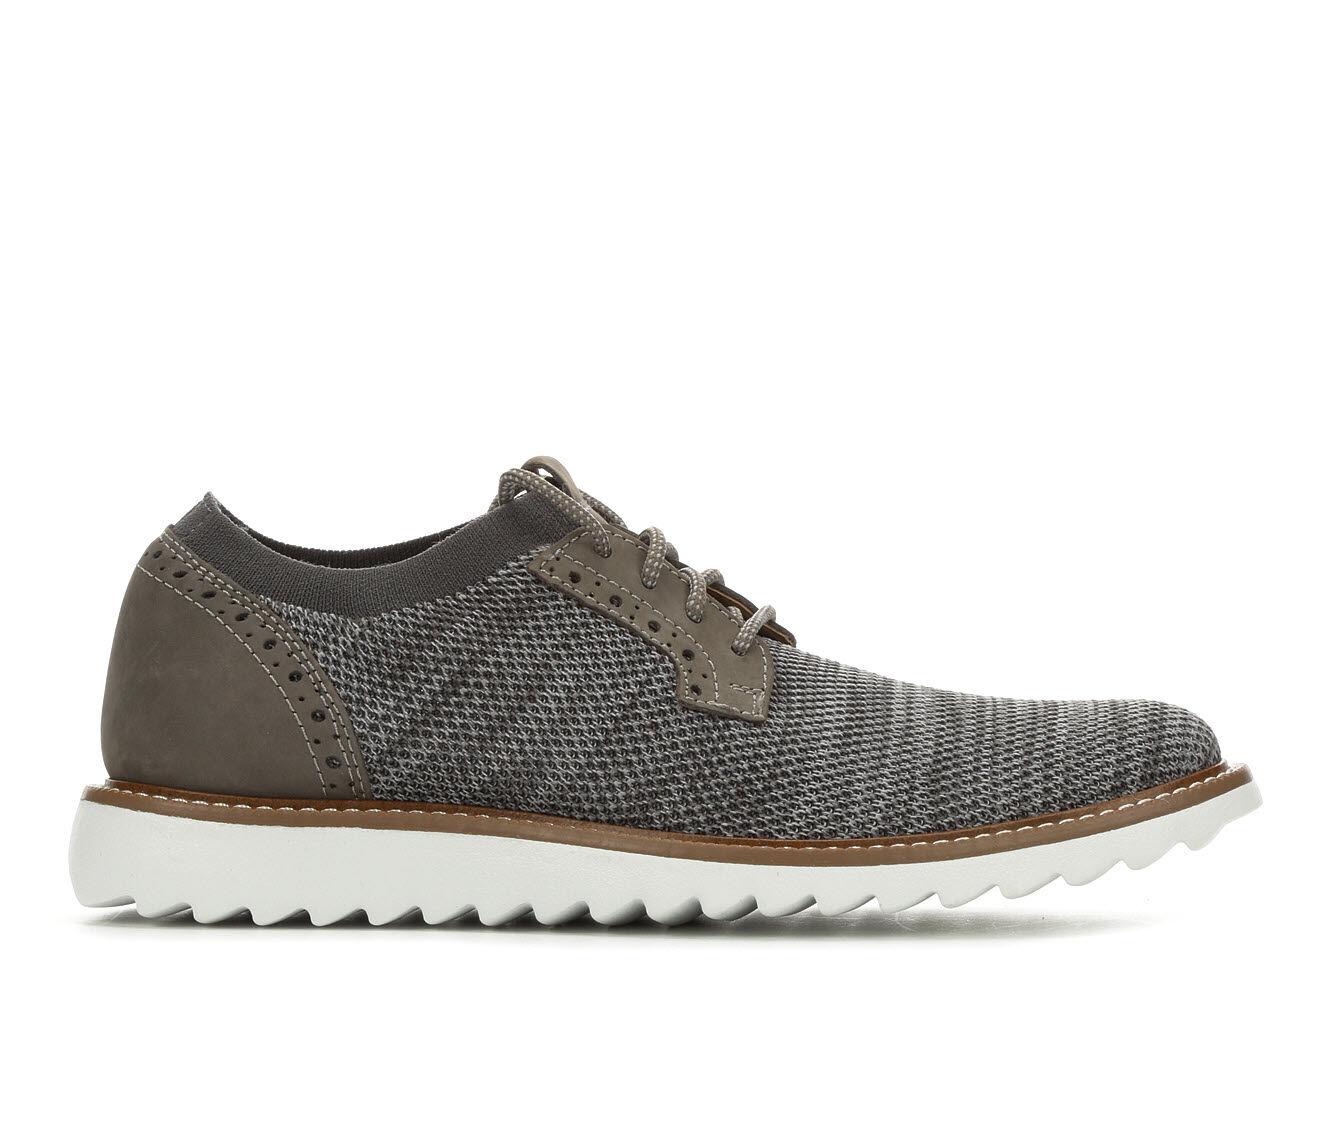 Crazy Price Men's Dockers Einstein Dress Shoes Grey